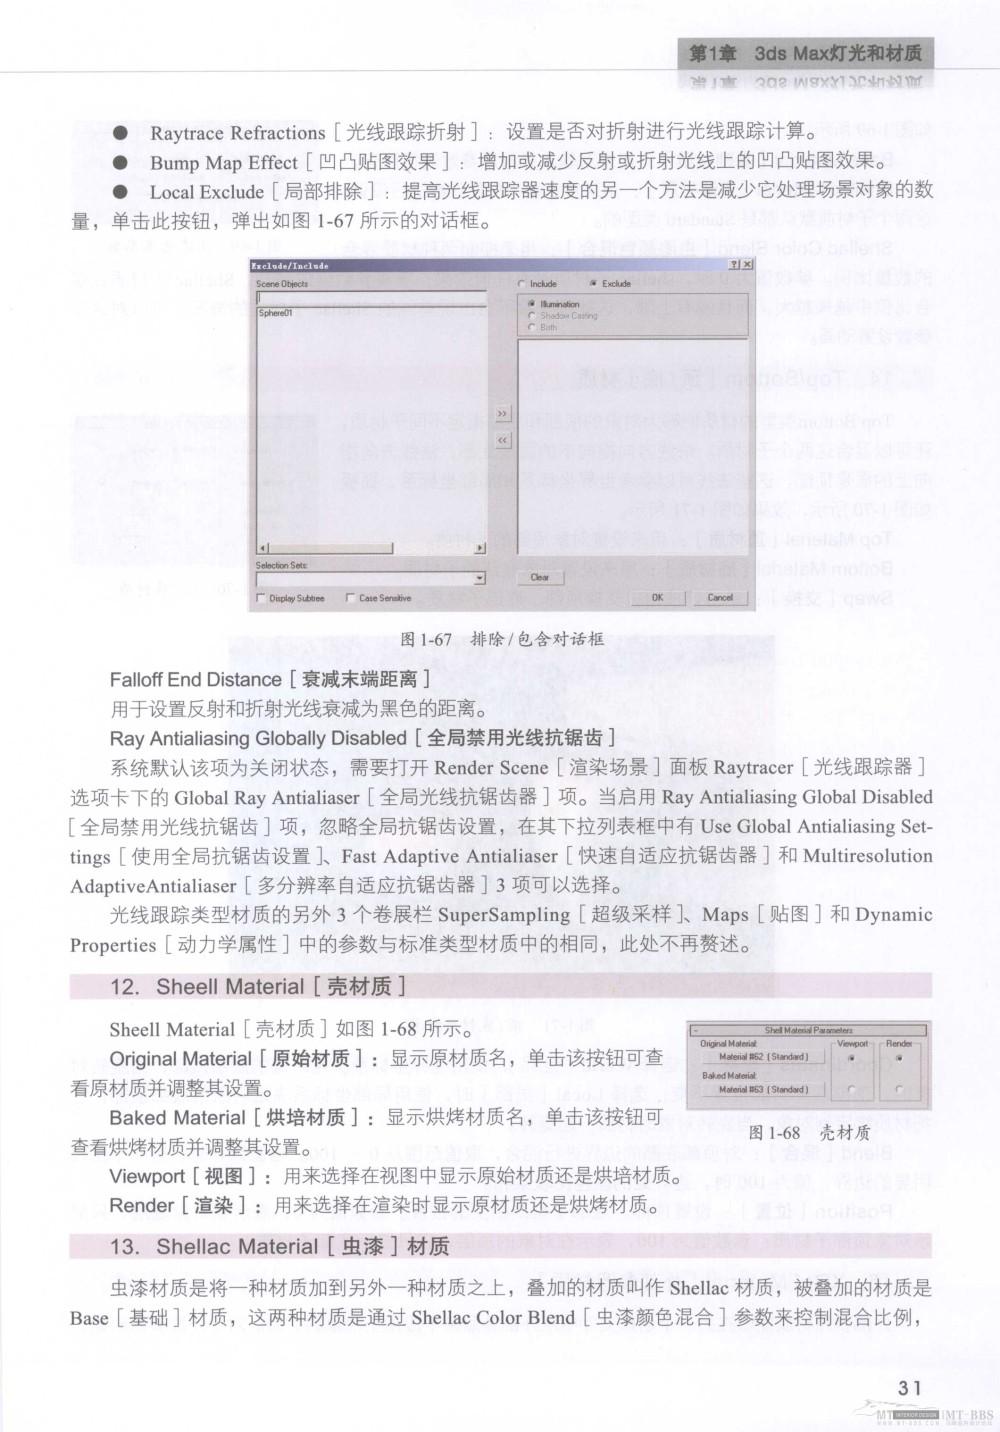 水晶石技法-3ds_Max&VRay室内空间表现_水晶石技法-3ds_Max&VRay室内空间表现_页面_037.jpg